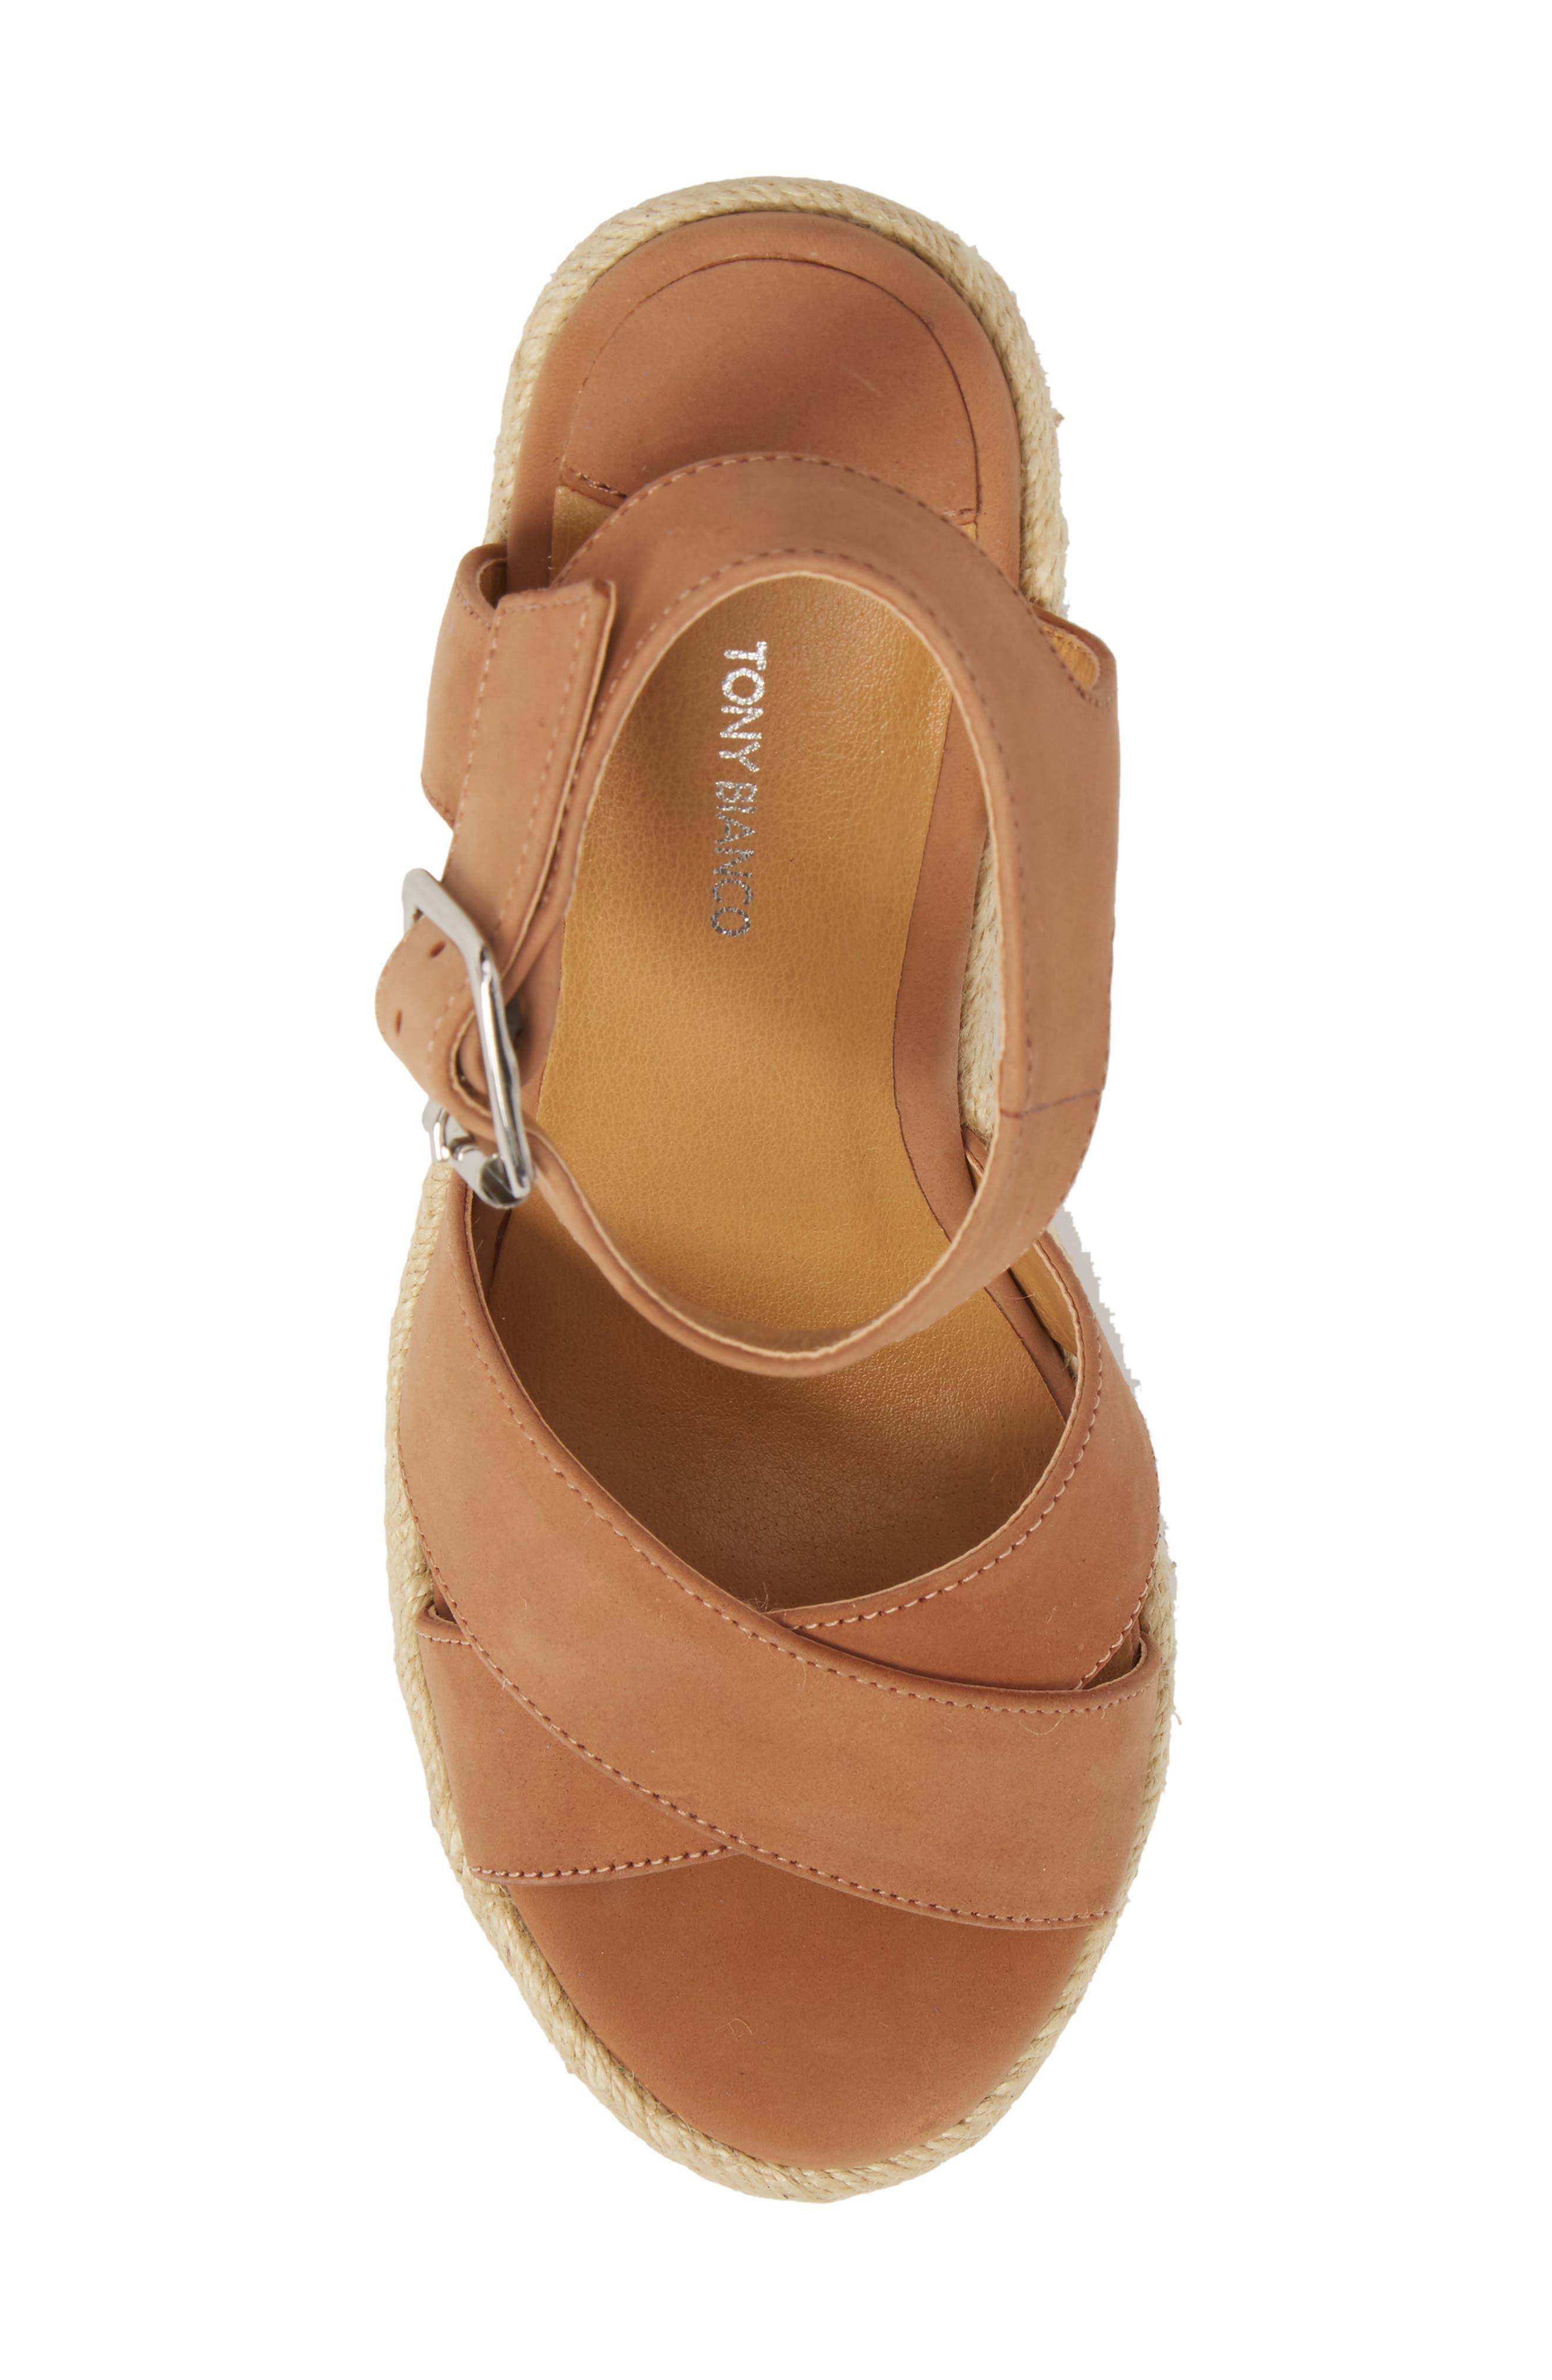 Boston Espadrille Wedge Sandal,                             Alternate thumbnail 5, color,                             Caramel Phoenix Leather